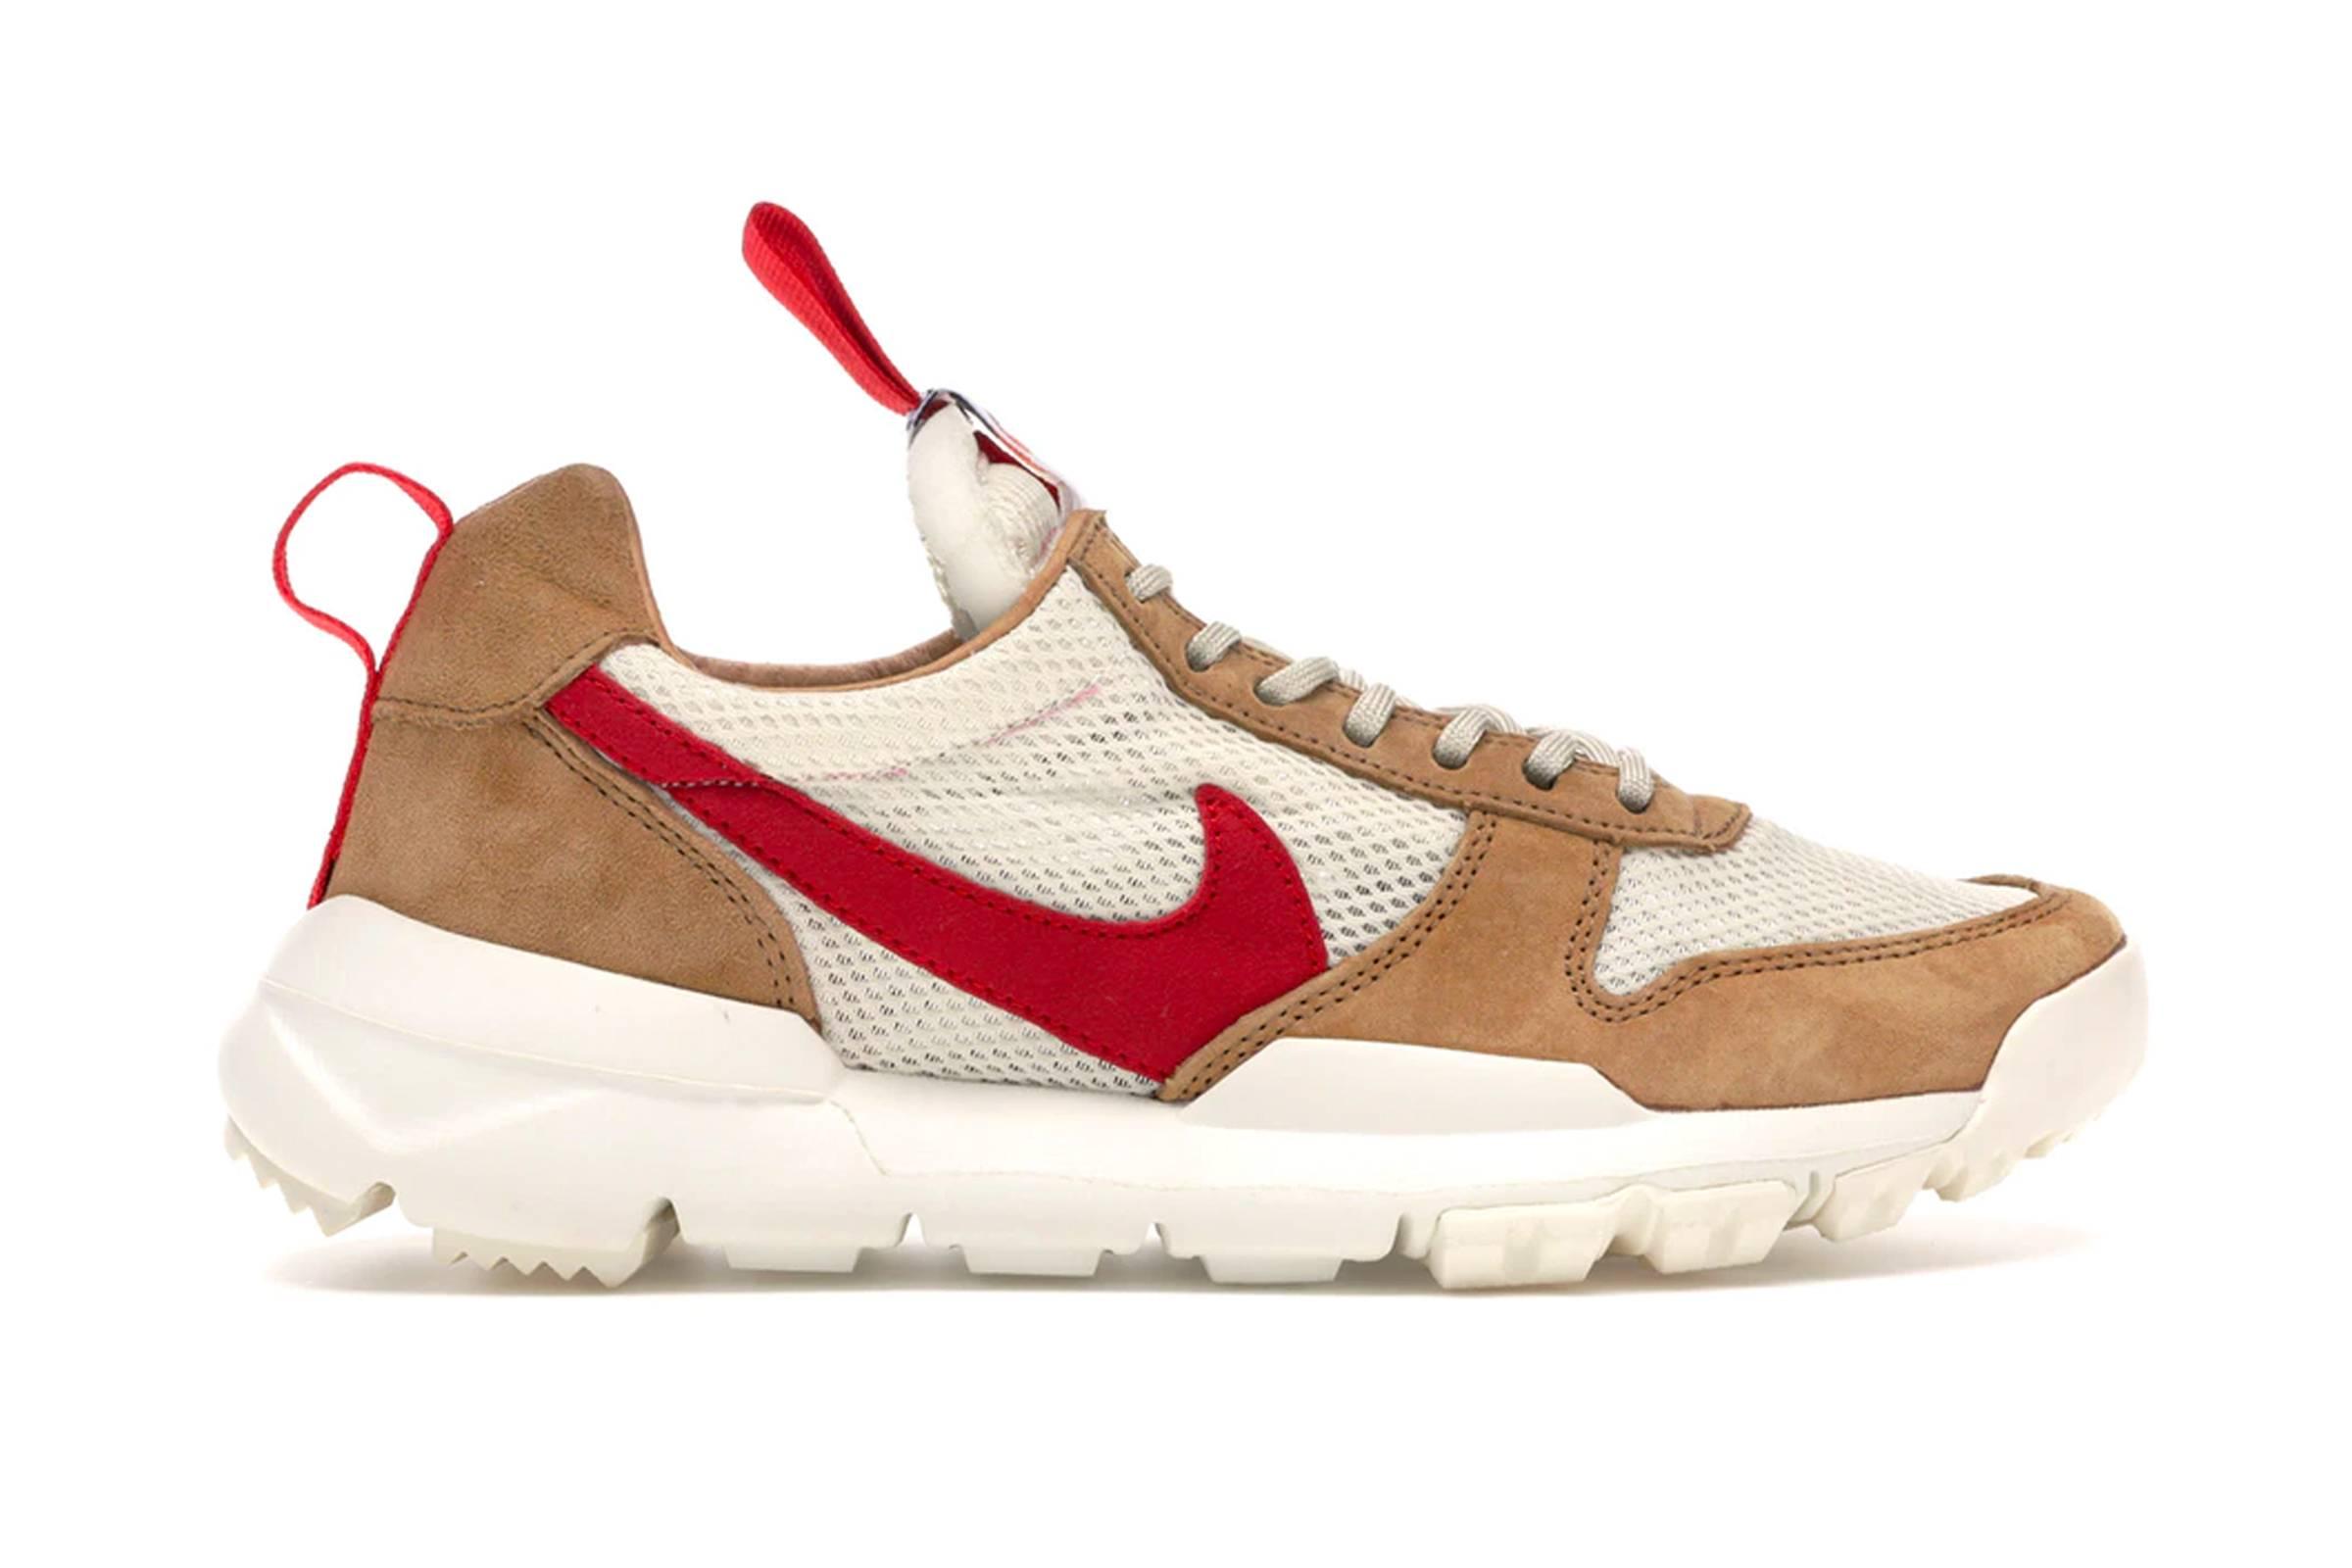 Tom Sachs x Nike Mars Yard 2.0